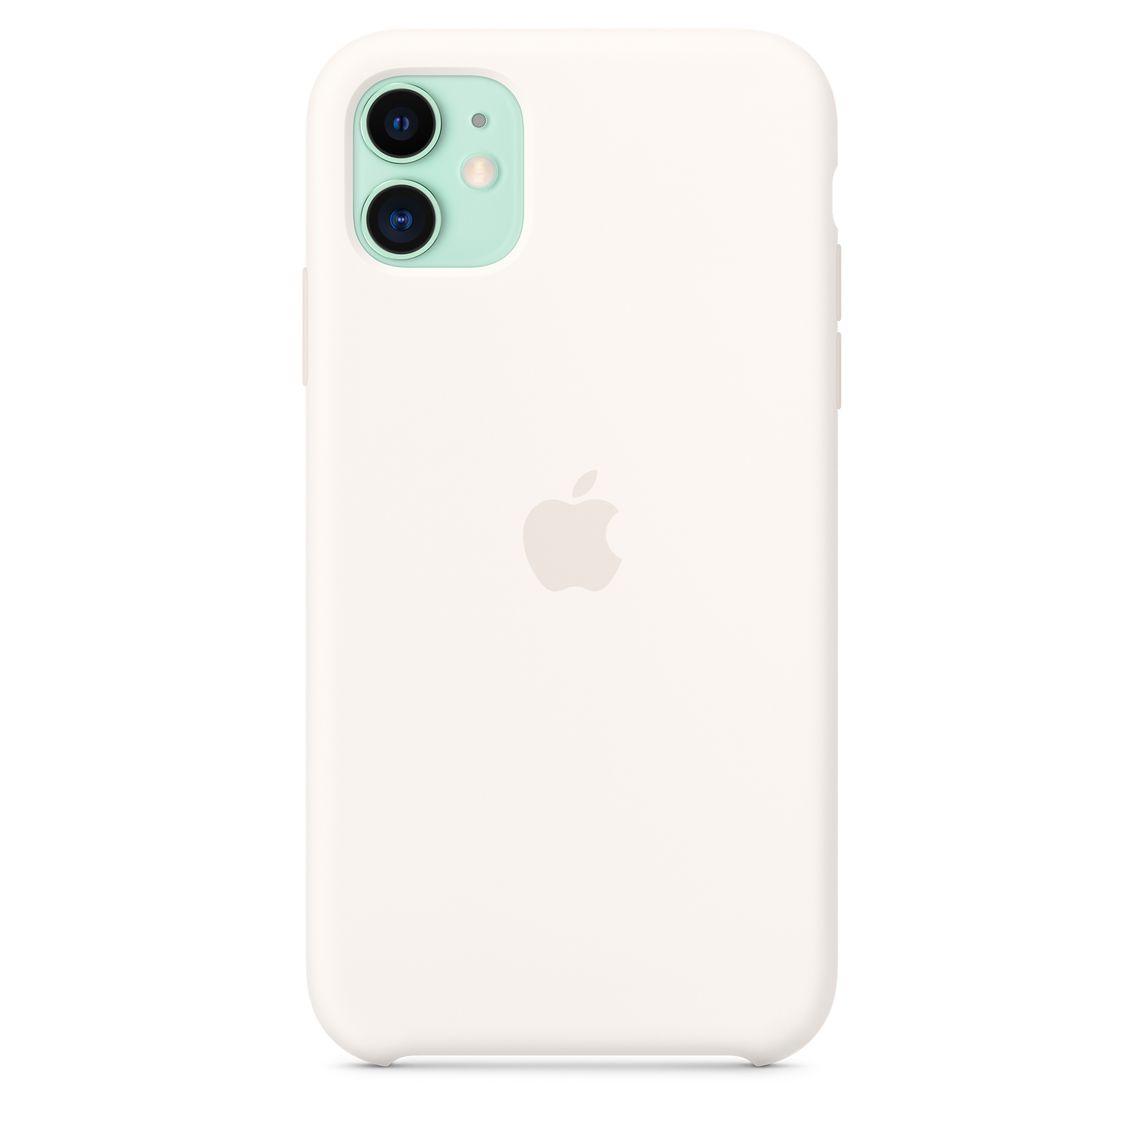 Custodia in silicone per iPhone 11 - Bianco panna